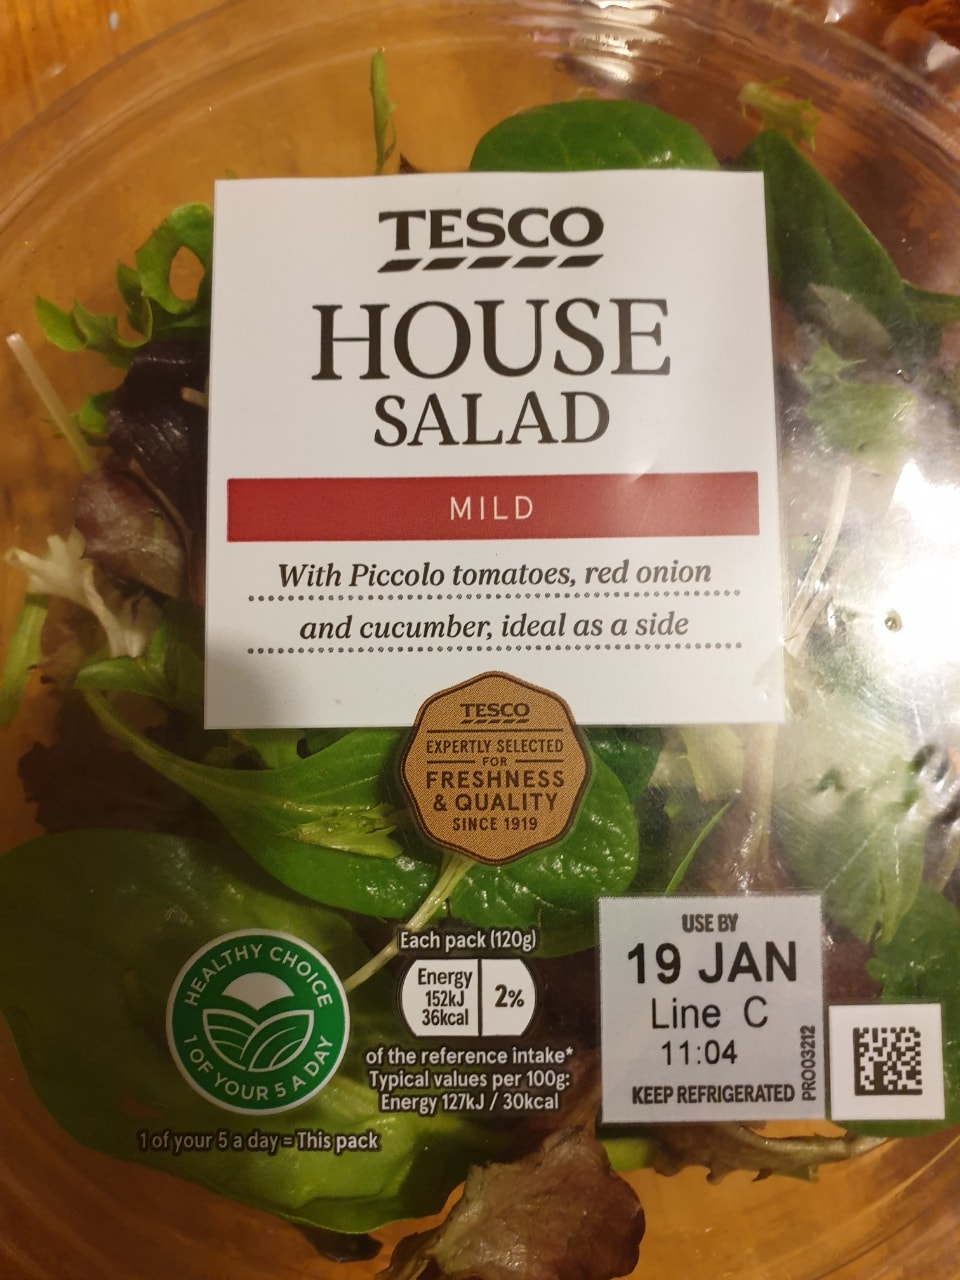 Tesco house salad